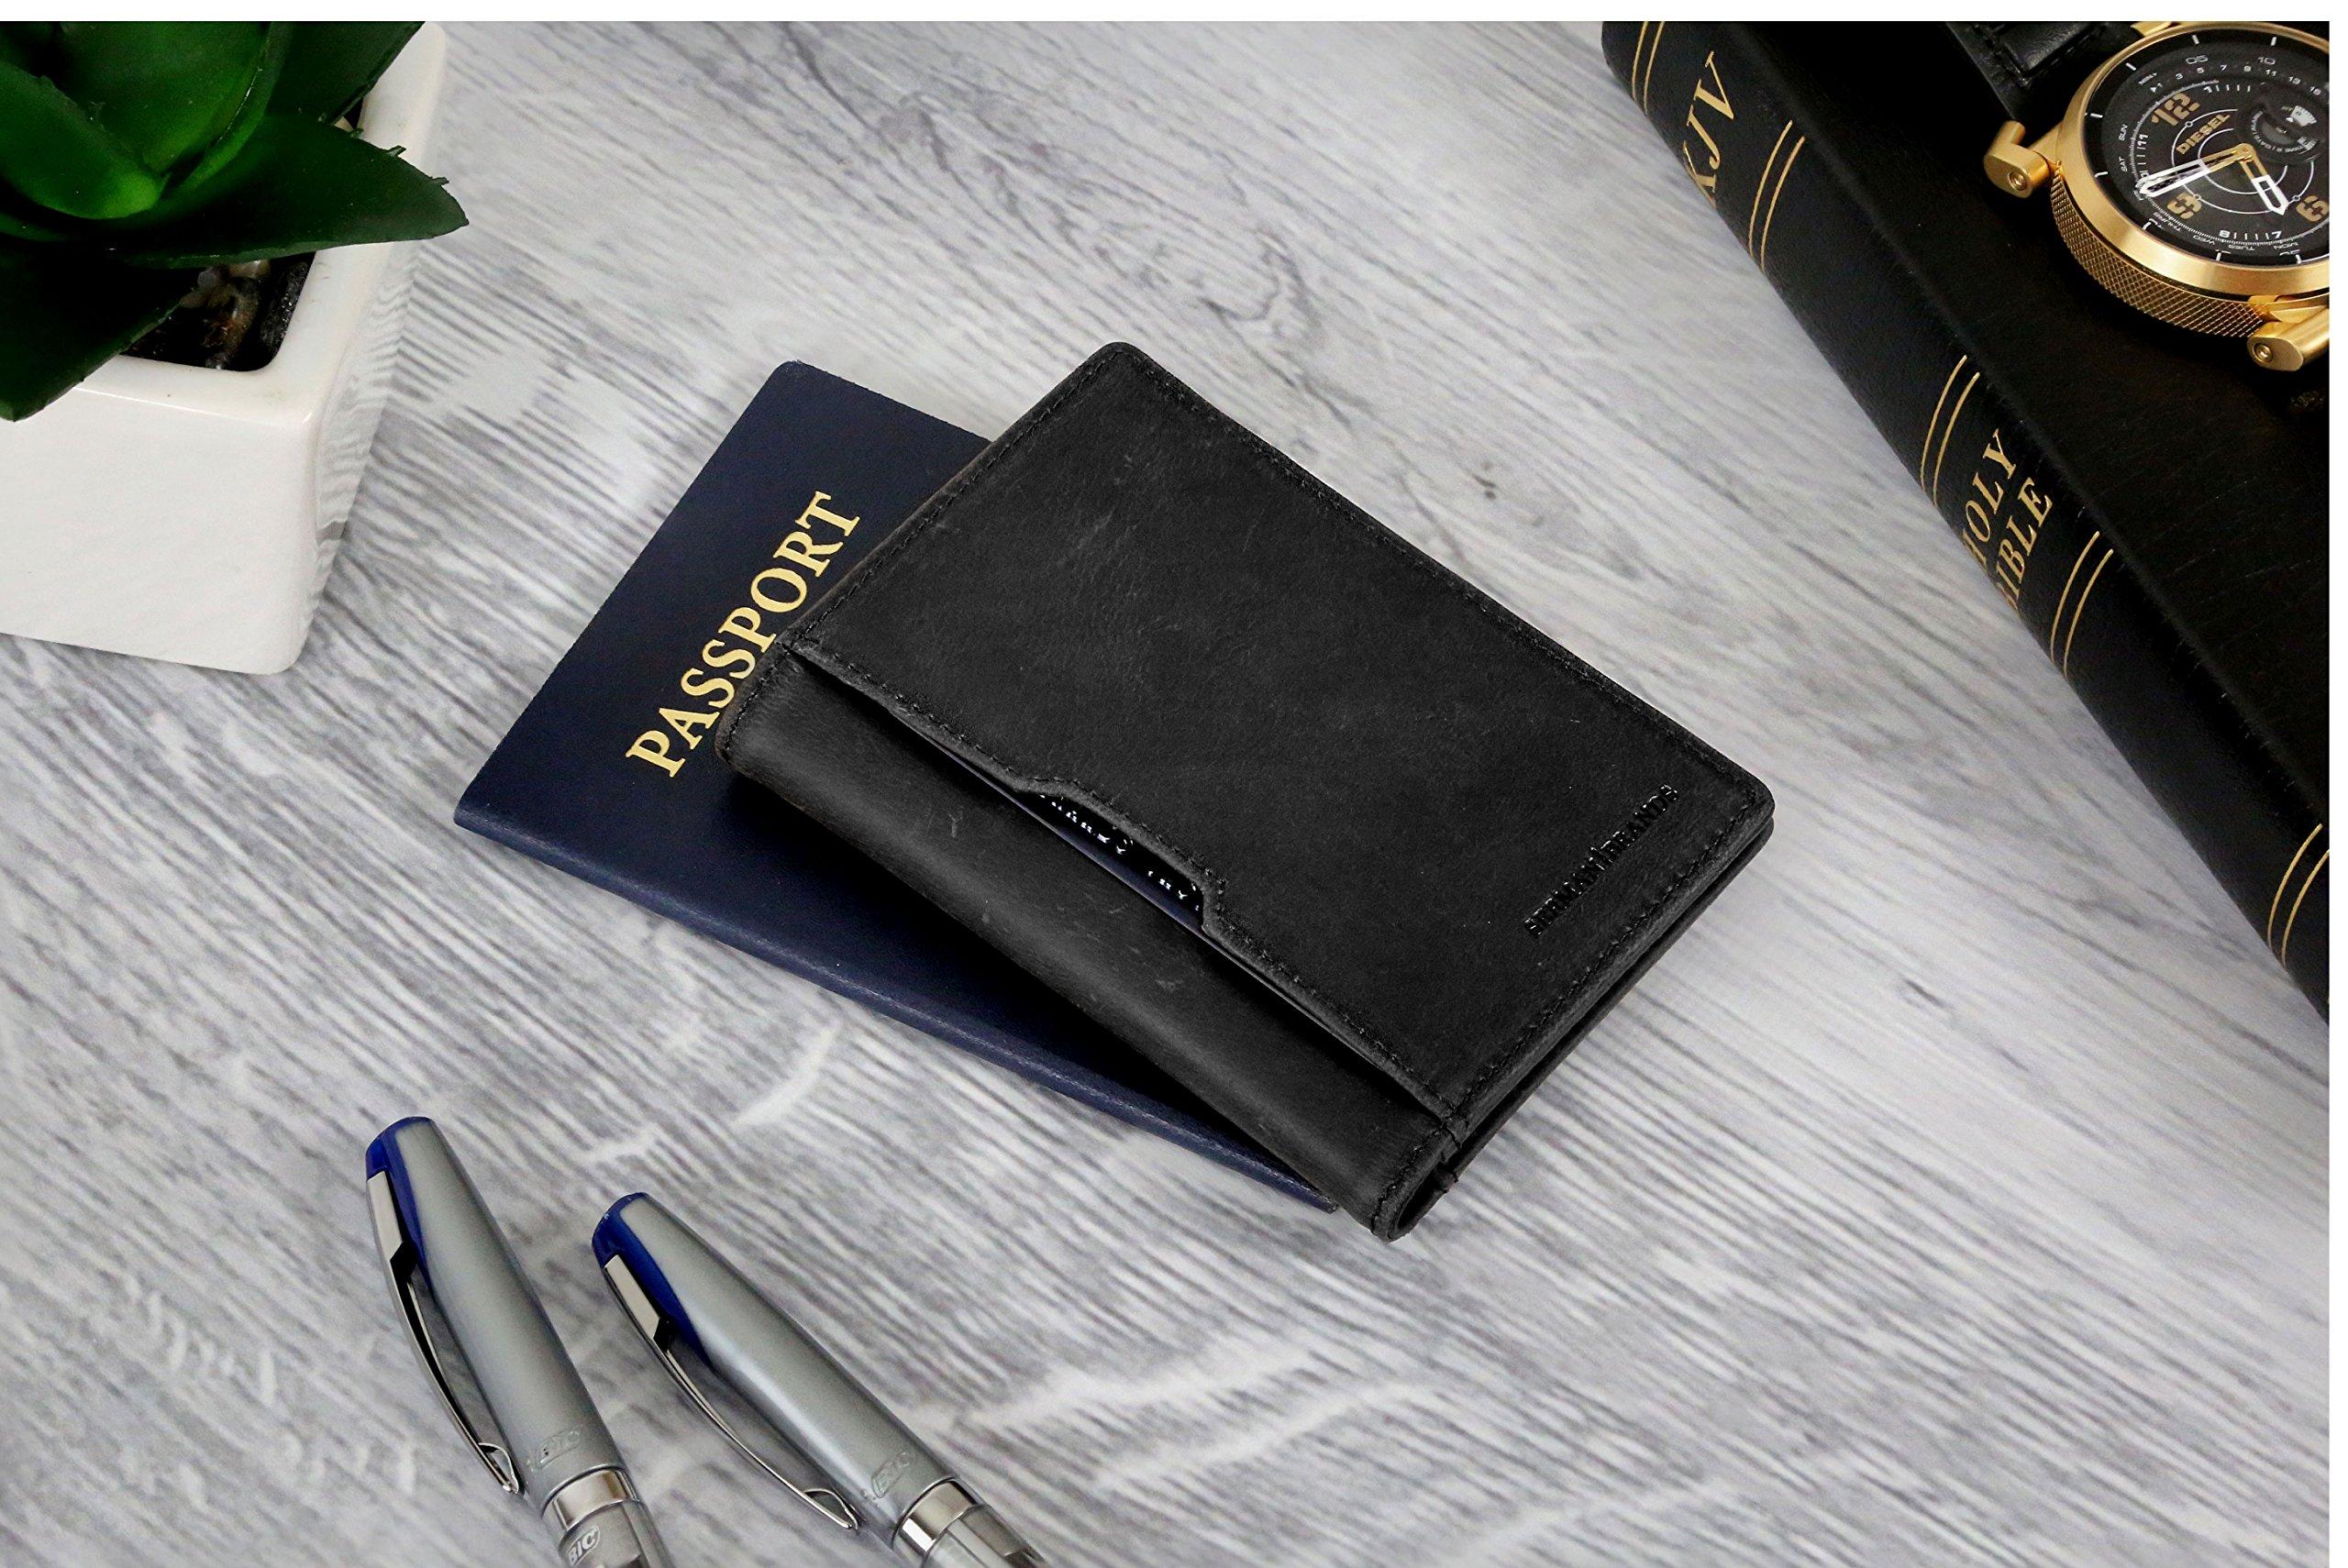 Wallets for Men Slim Mens leather RFID Blocking Minimalist Card Front Pocket Bifold Travel Thin (Charcoal Black 5.0) by SERMAN BRANDS (Image #3)